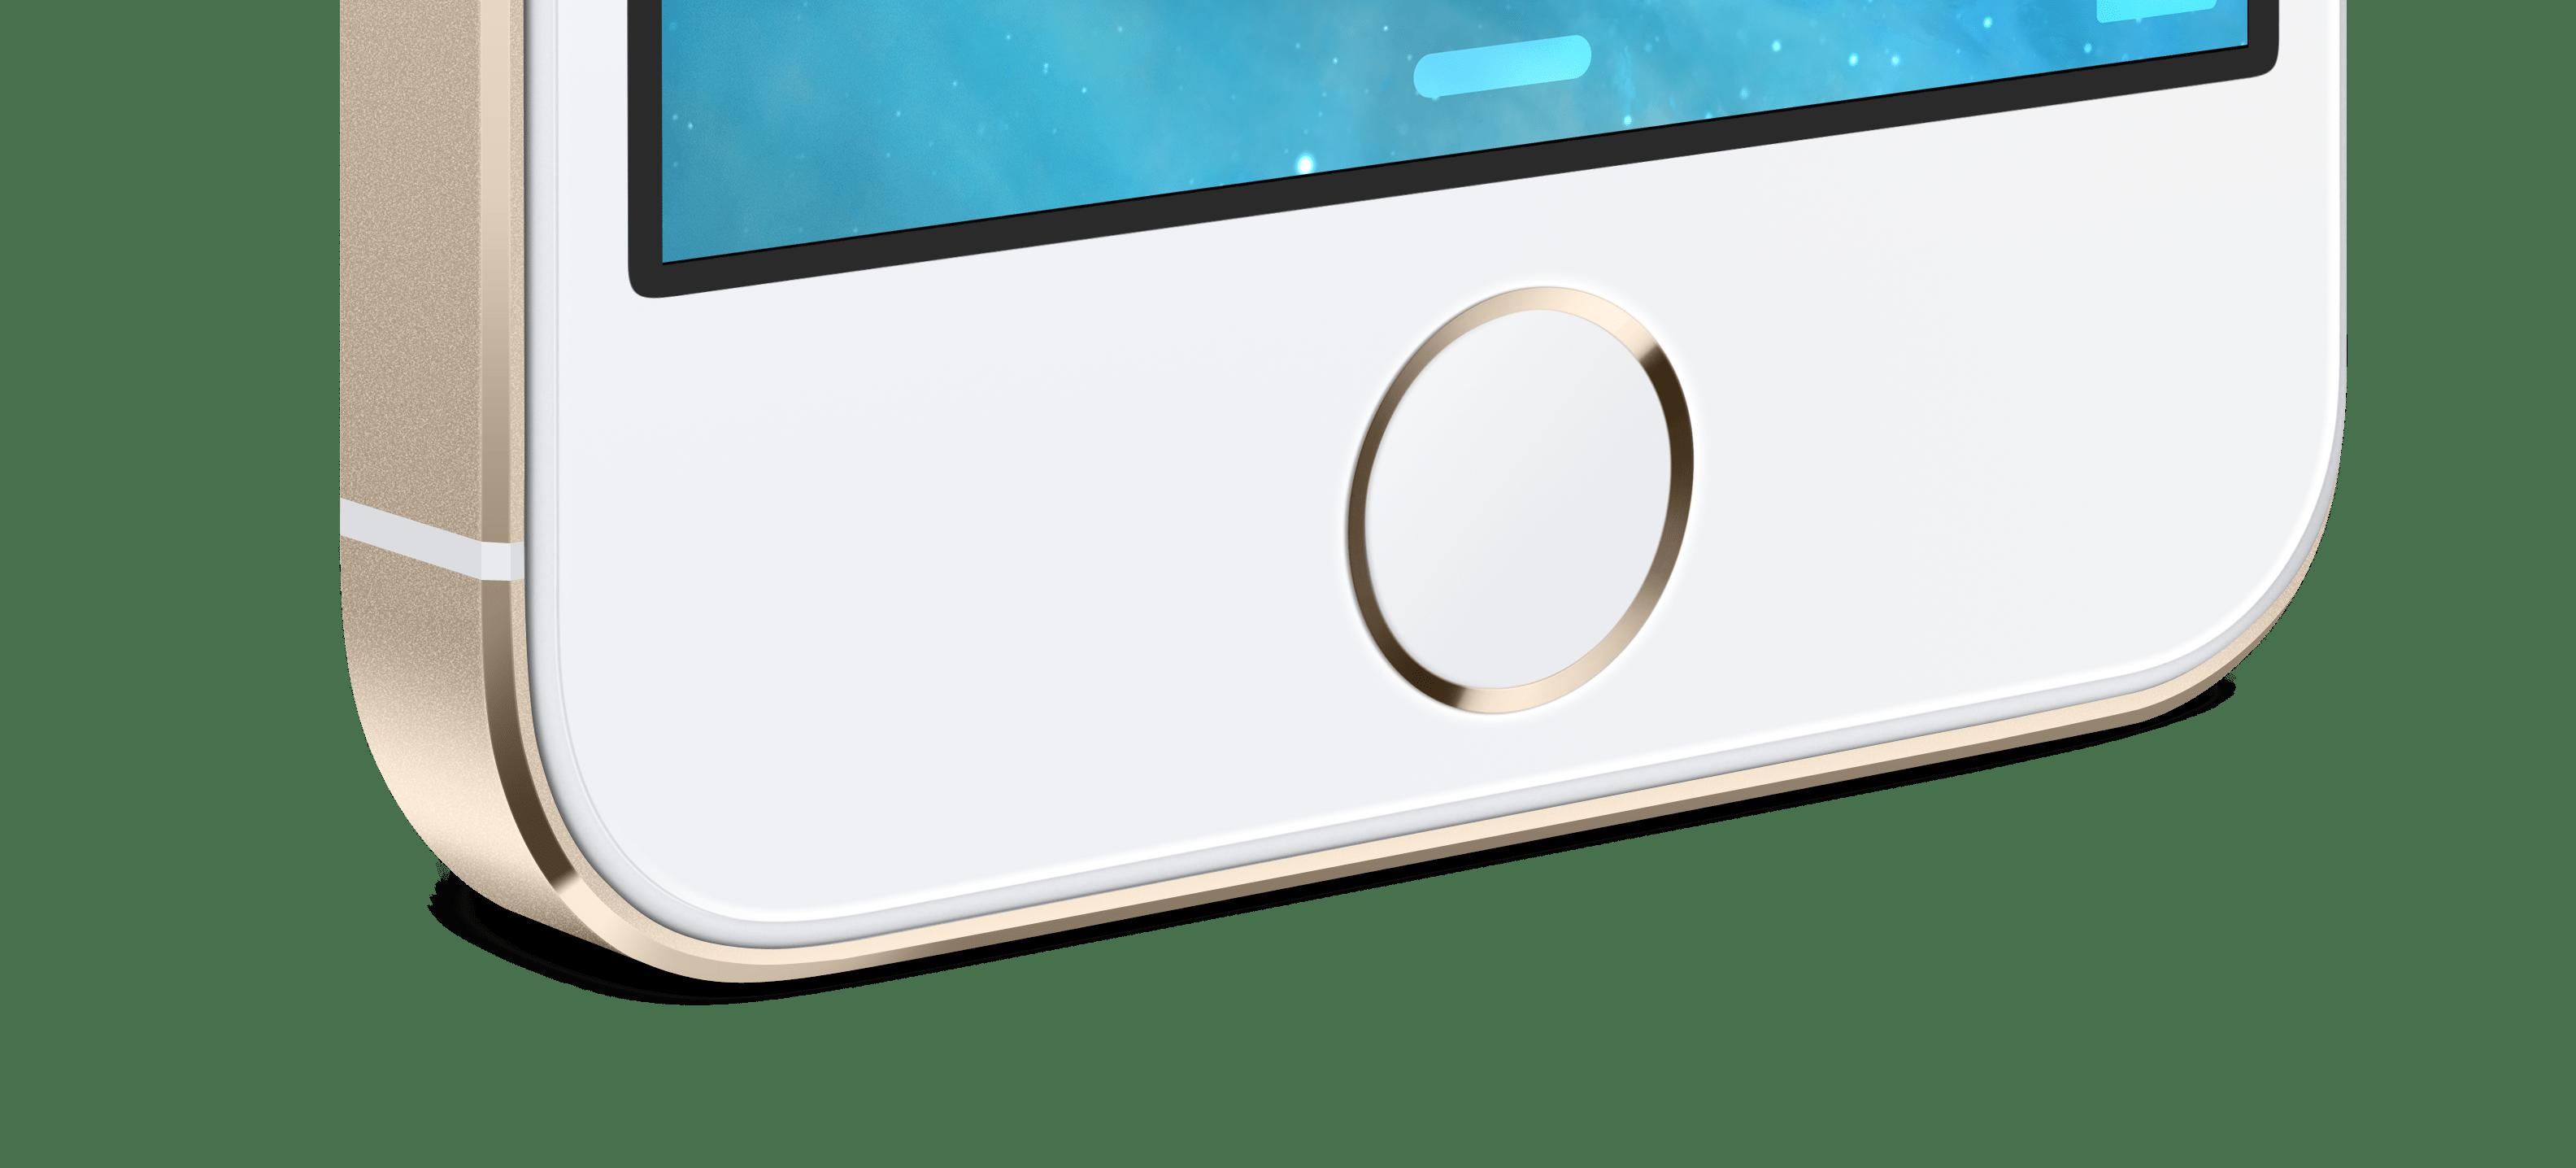 image003 - Cẩm nang sửa lỗi iPhone (phần 4)